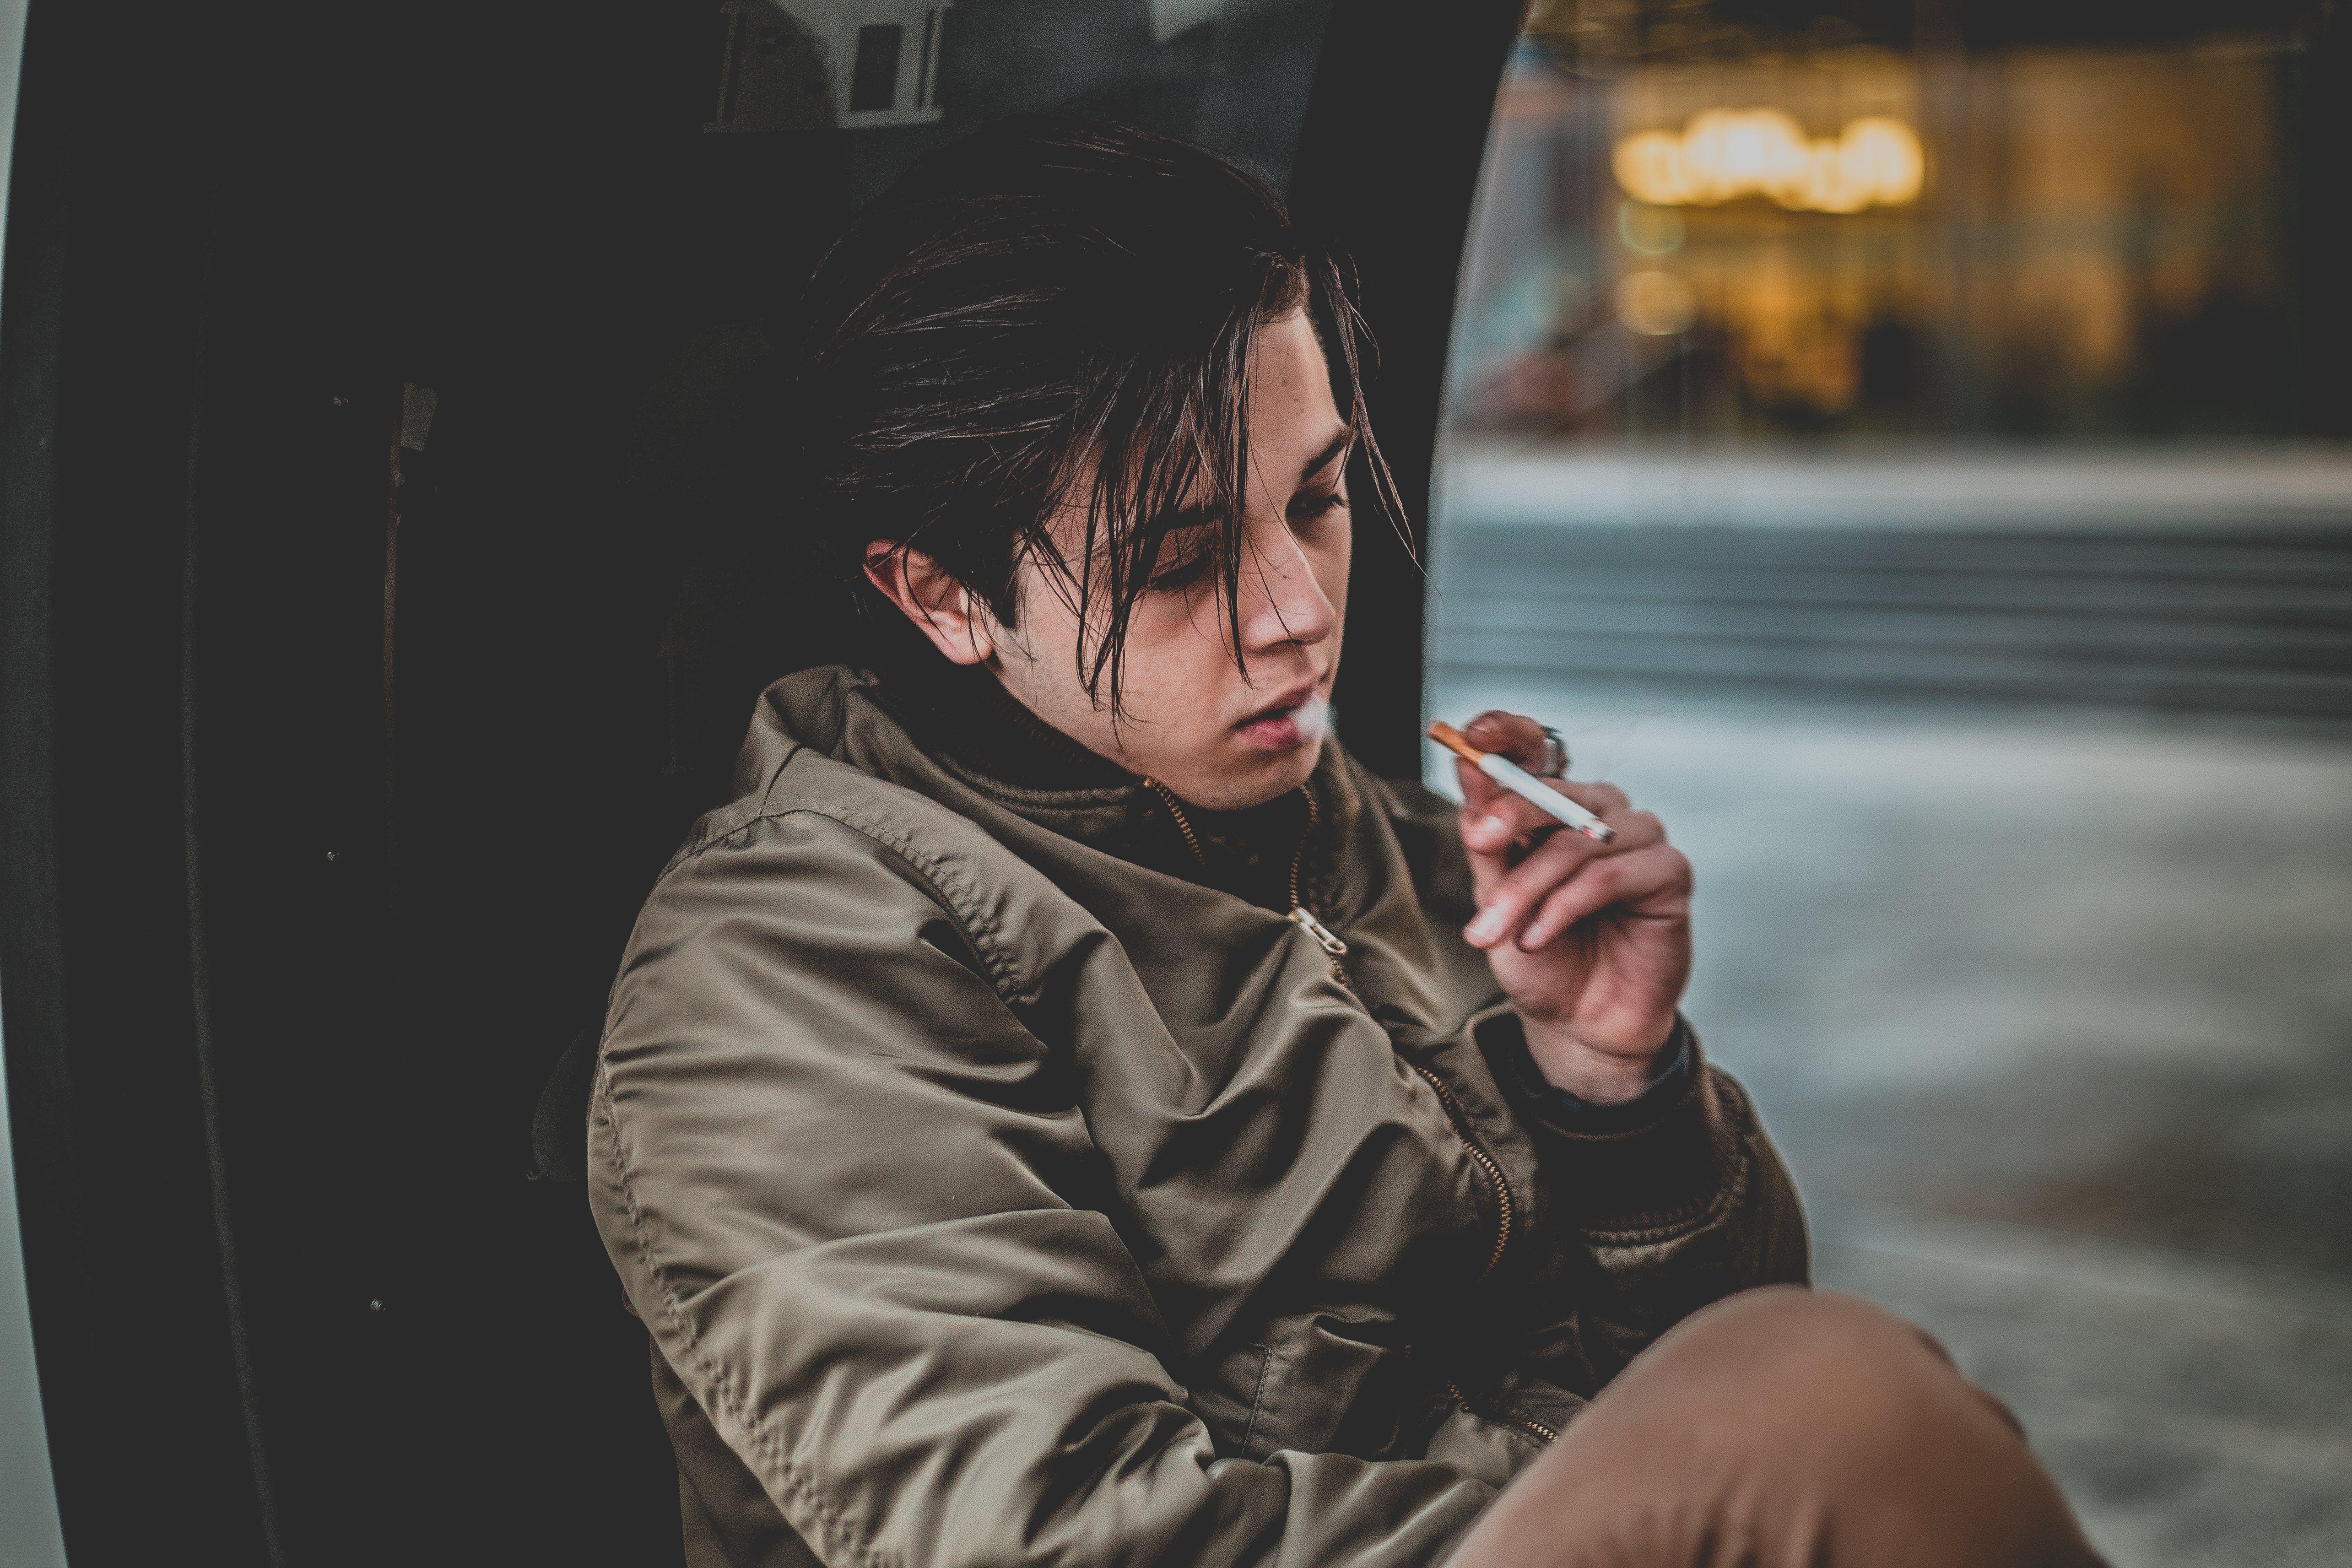 Man Wearing Gray Jacket Holding Cigarette